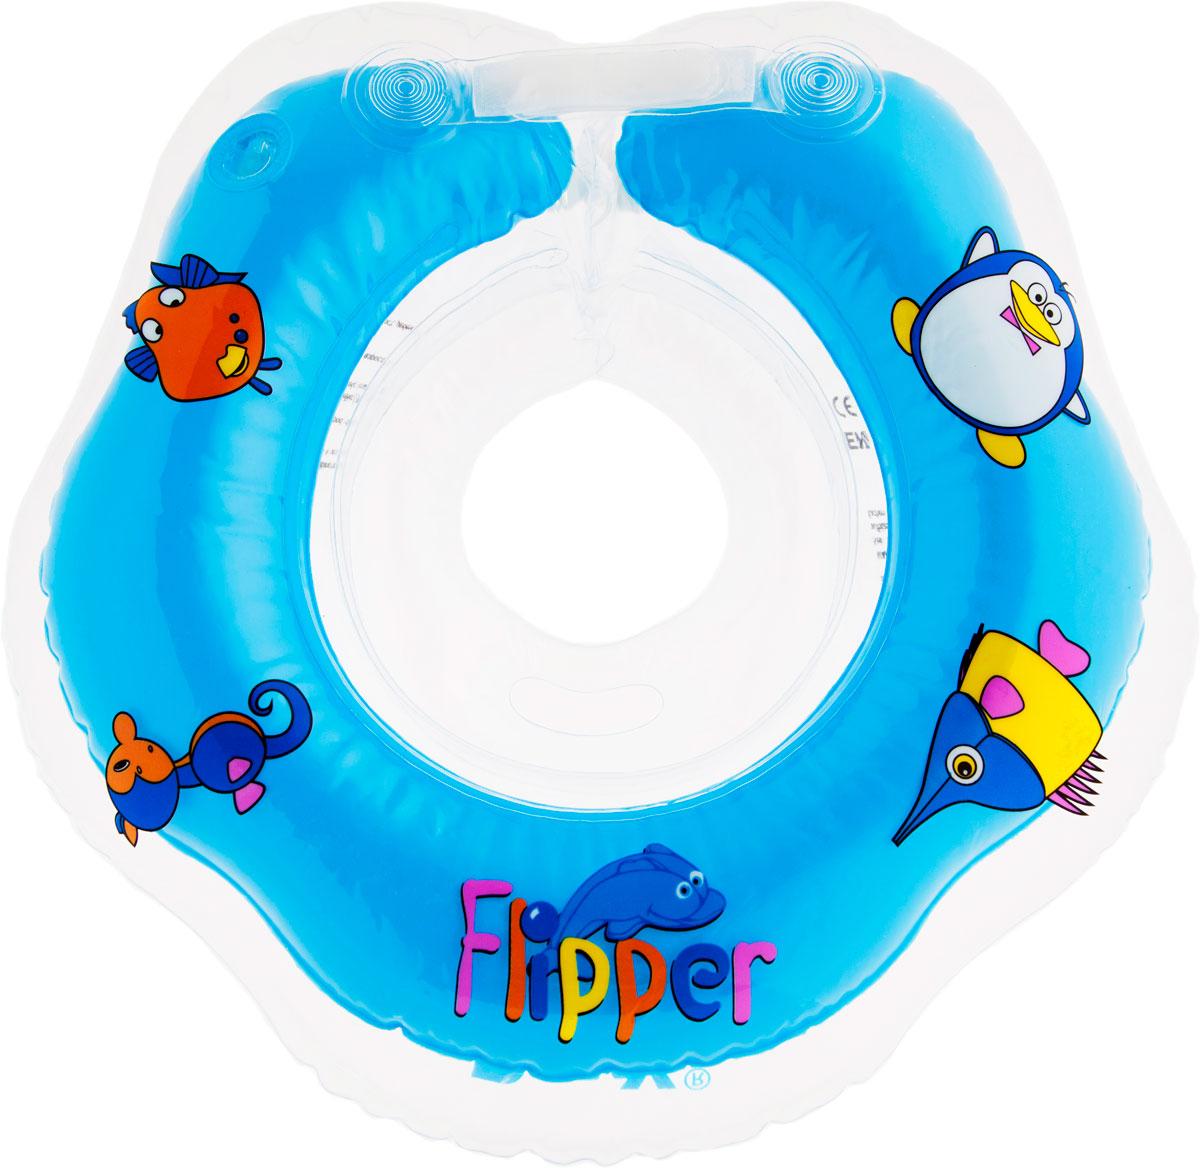 Roxy-kids Круг музыкальный на шею для купания Flipper -  Все для купания